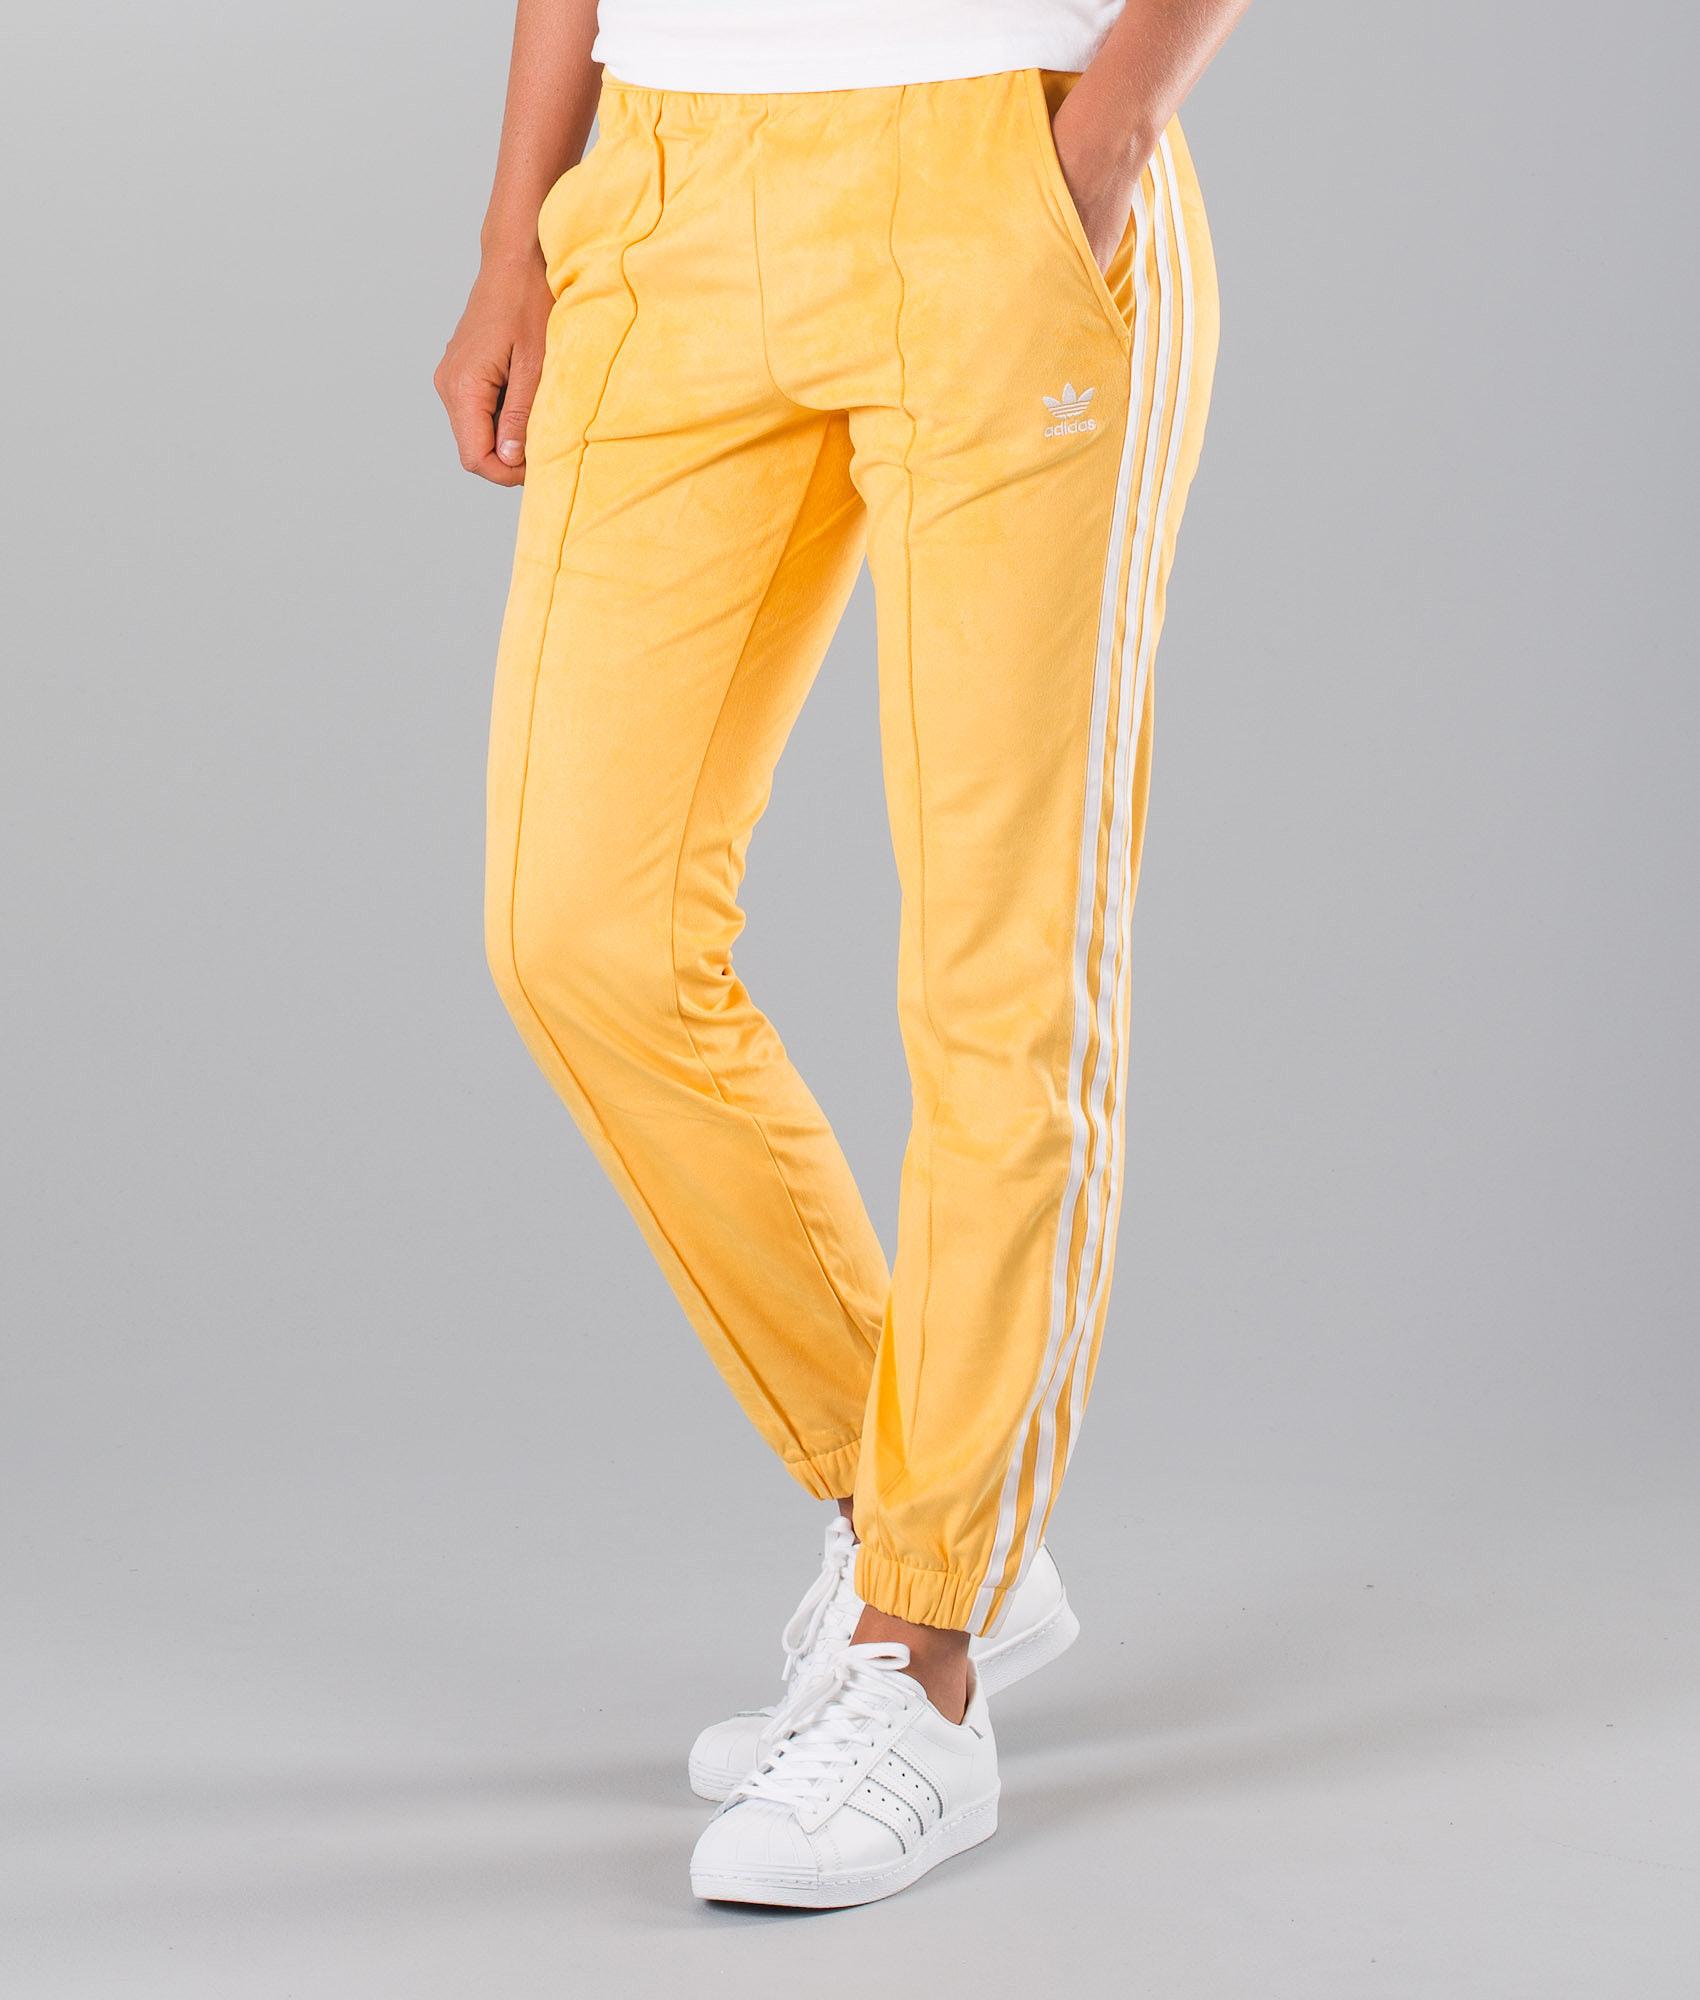 283230bb521670 Adidas Originals Regular Trackpant Cuf Hosen Chalk Orange - Ridestore.de